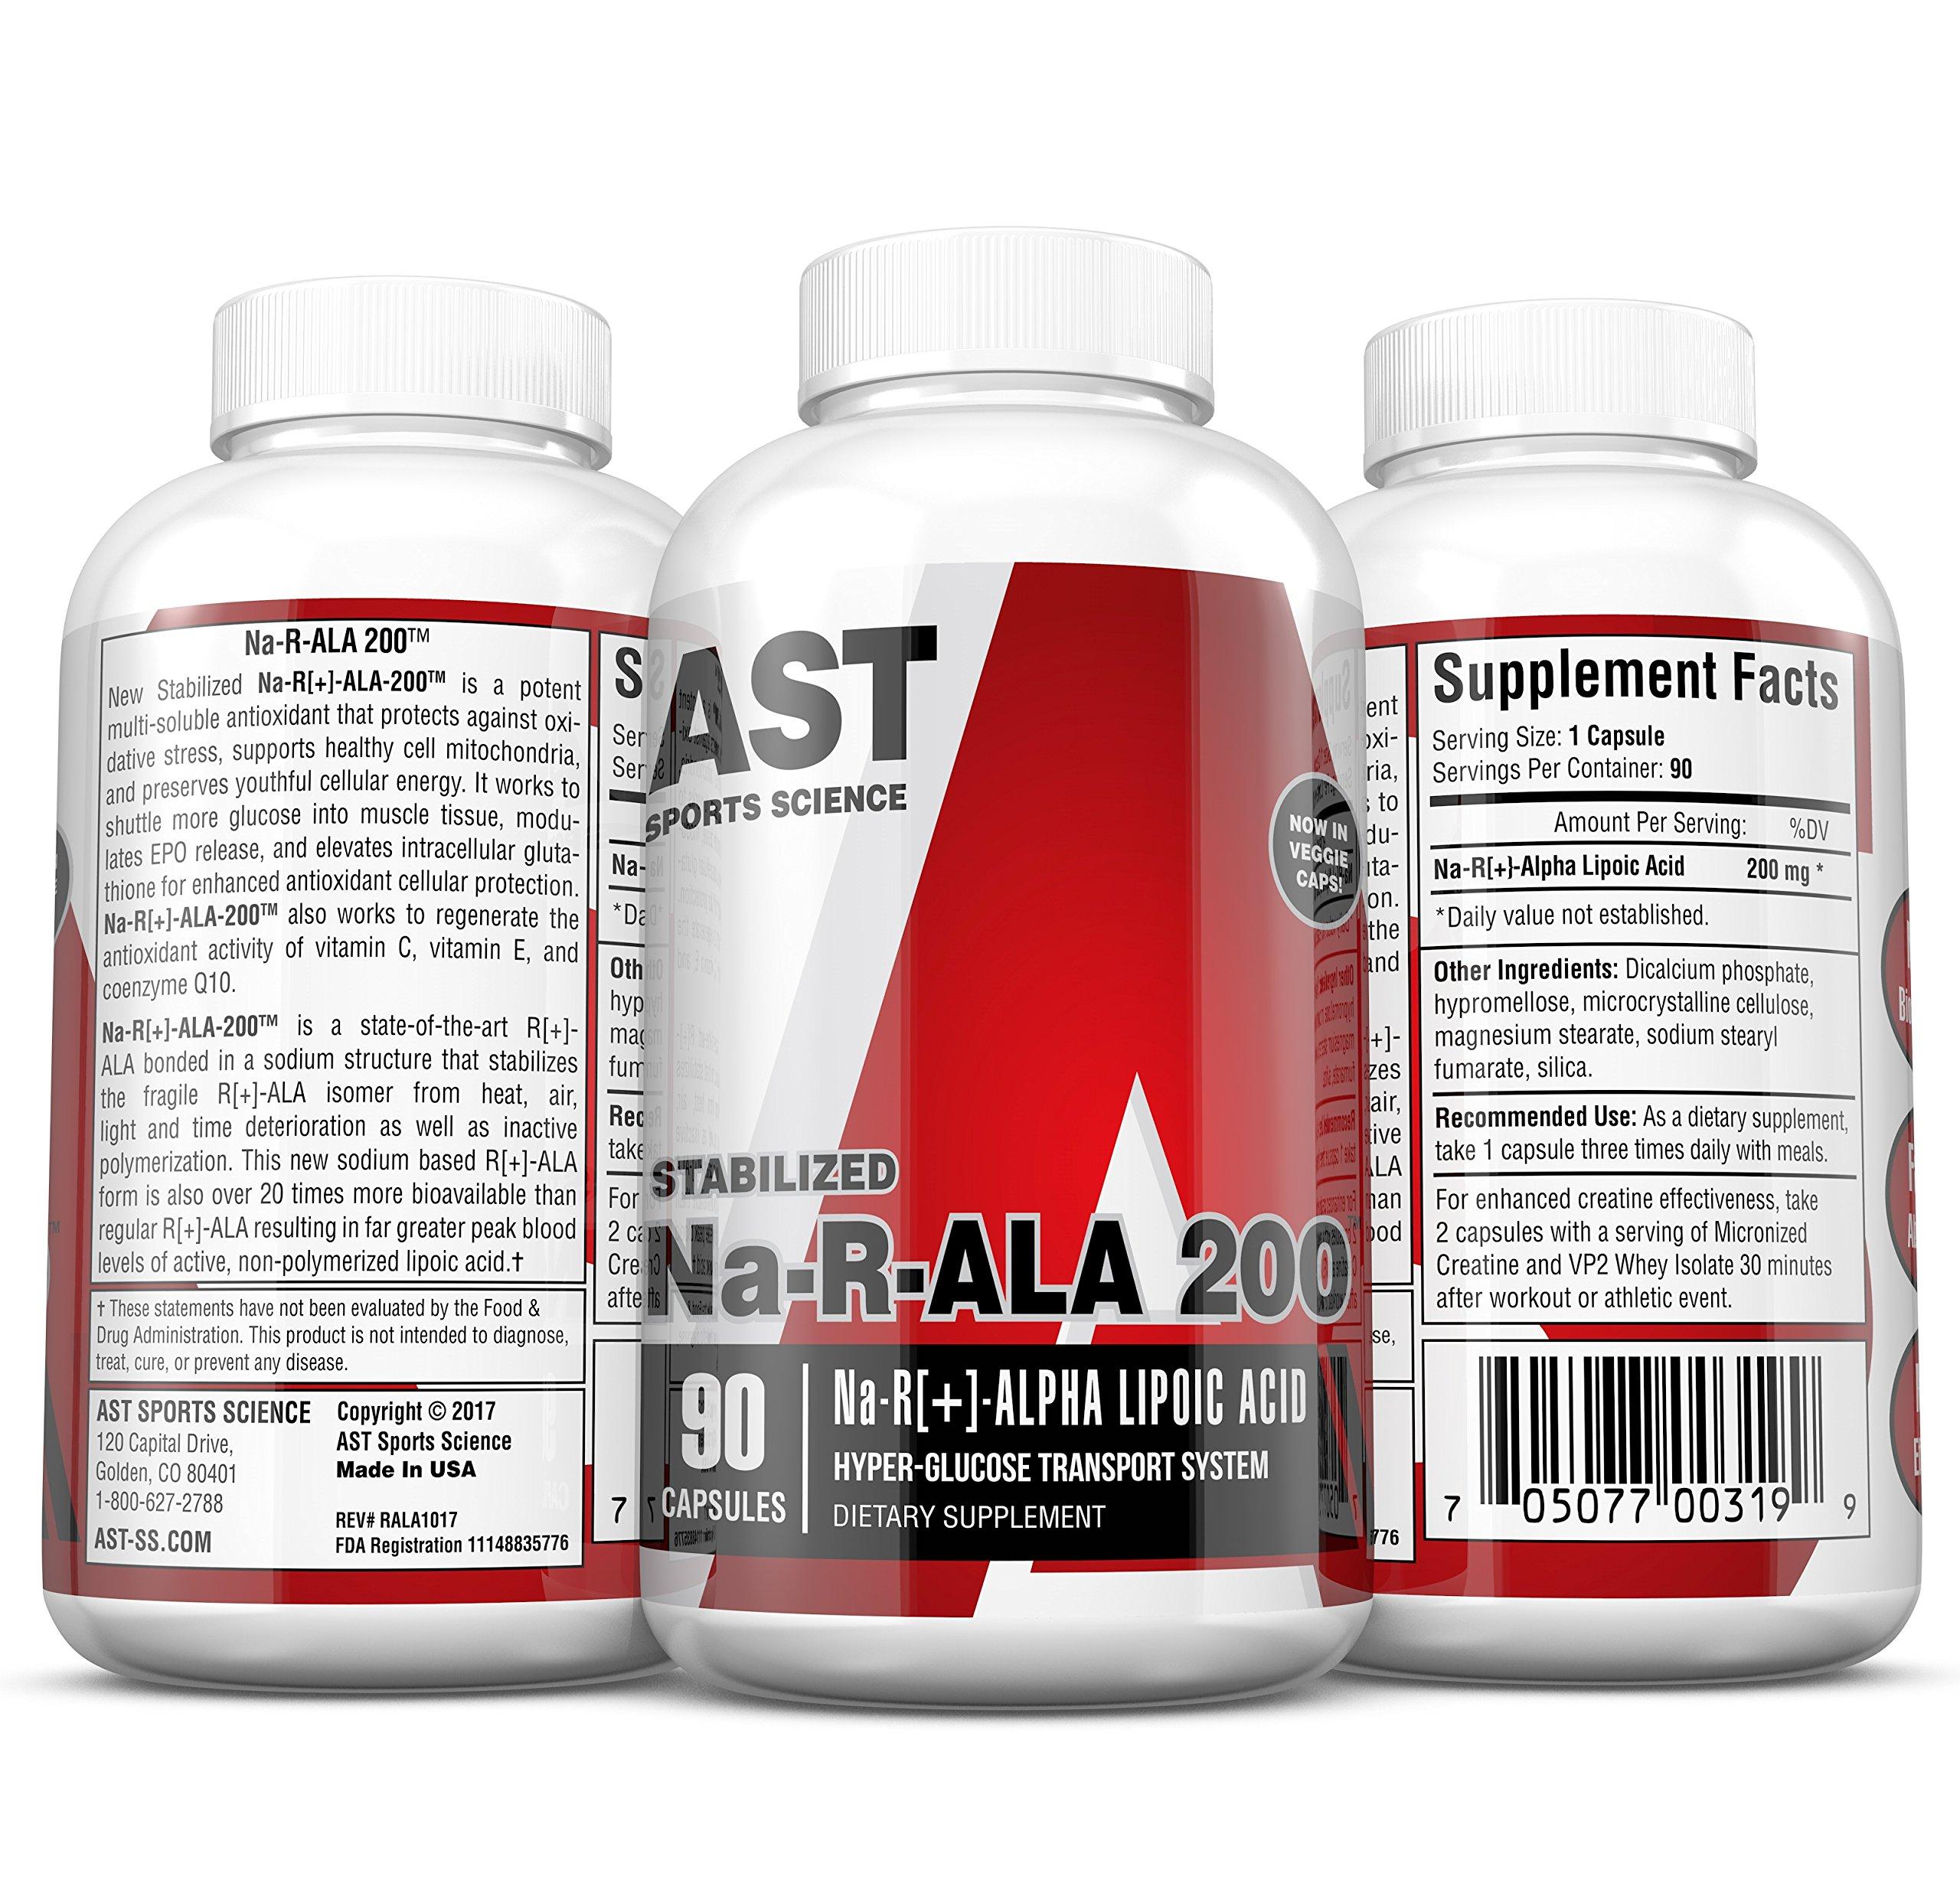 AST Sports Science Na-r-Ala 200 R[+]-Alpha Lipoic Acid Capsules, 90 Count